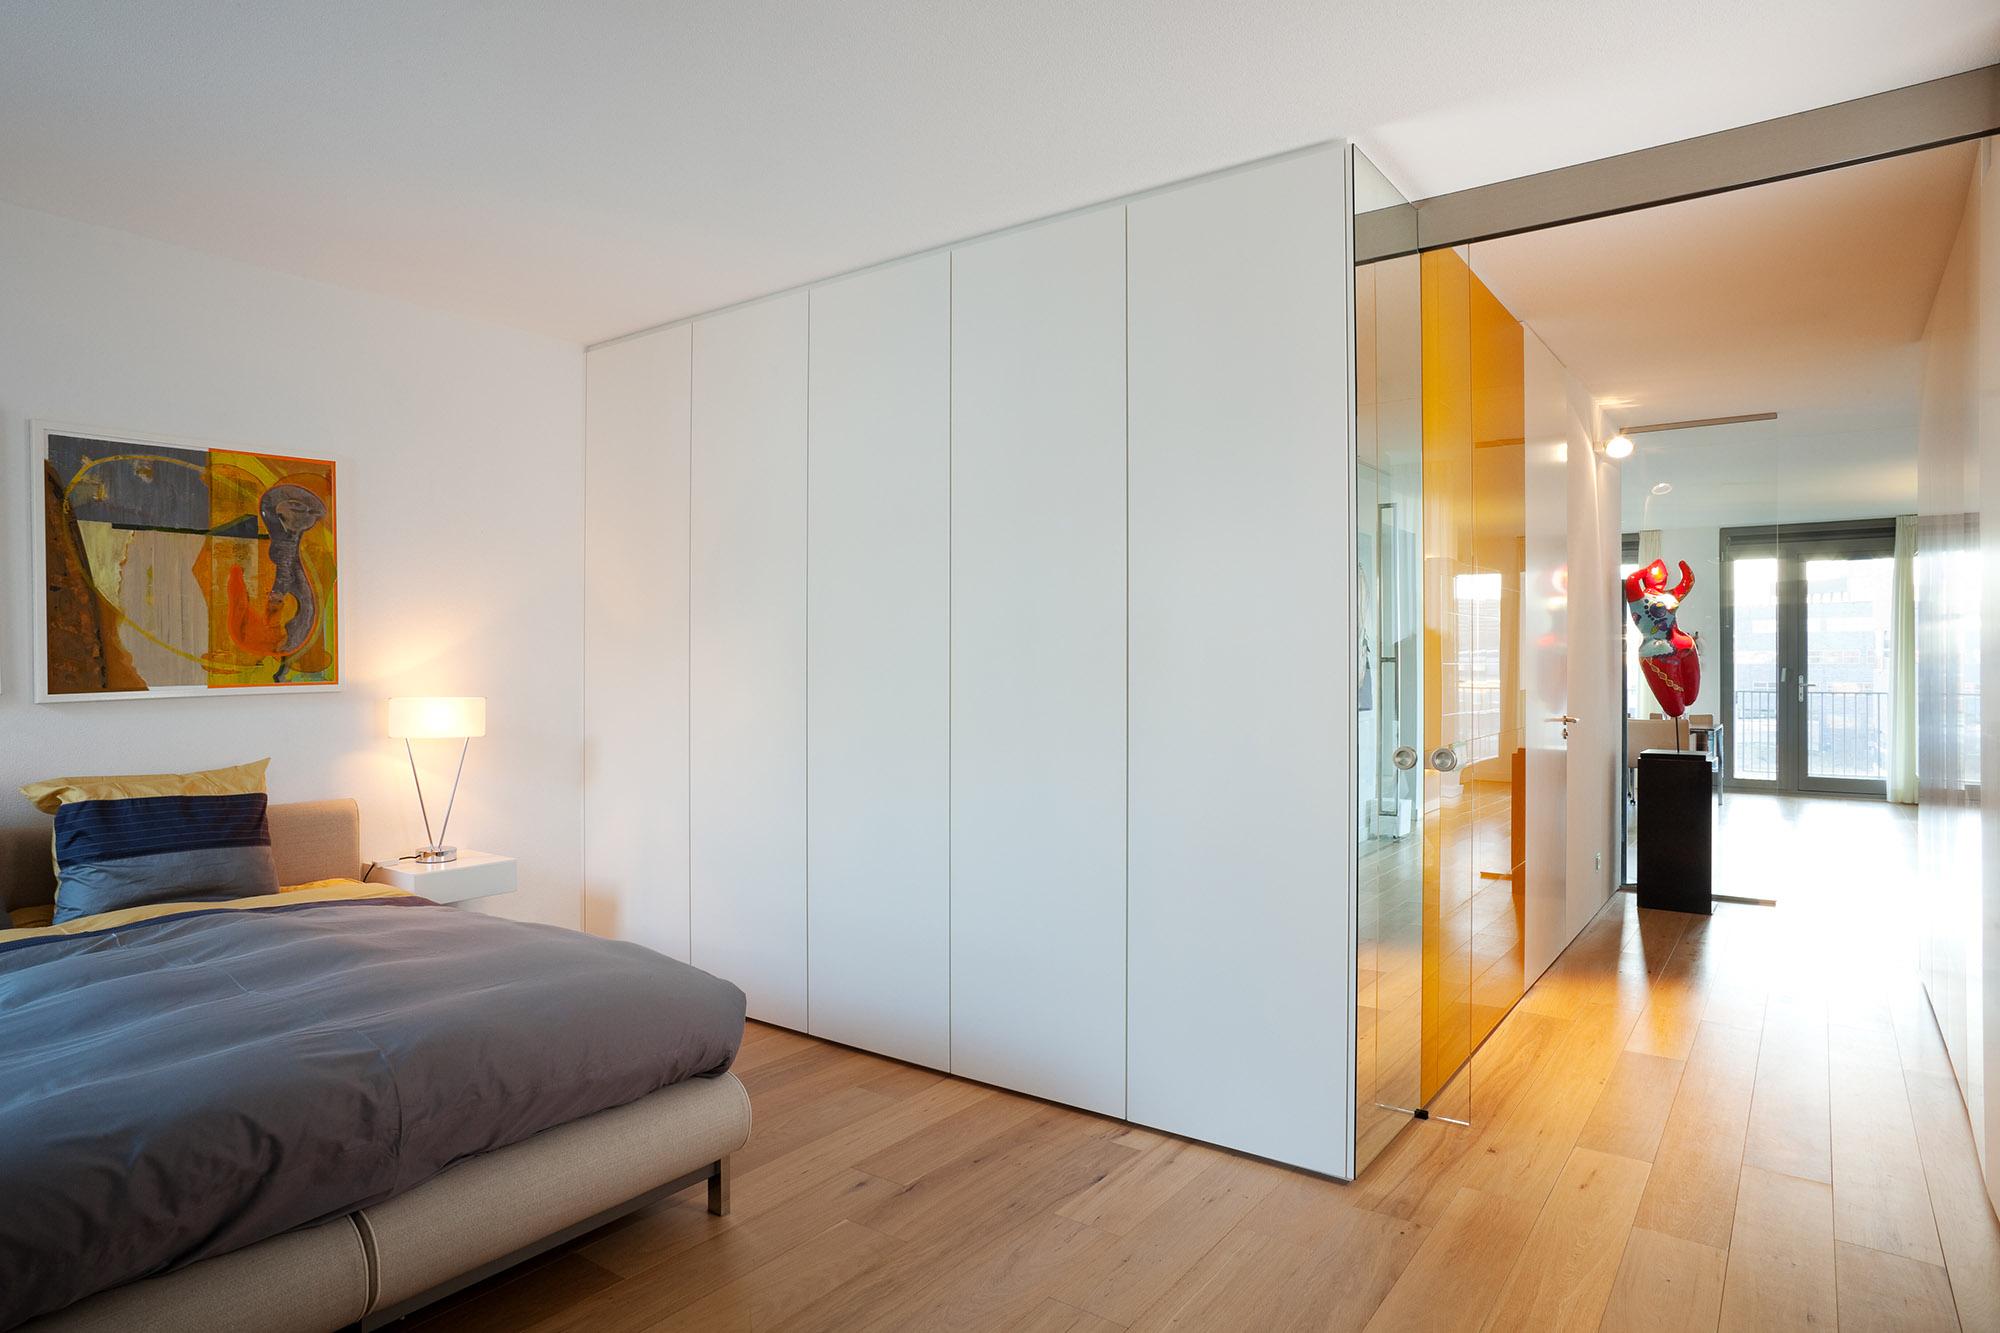 SPUISERS interieur fotografie dressoir kast Huntjens interieurbouw